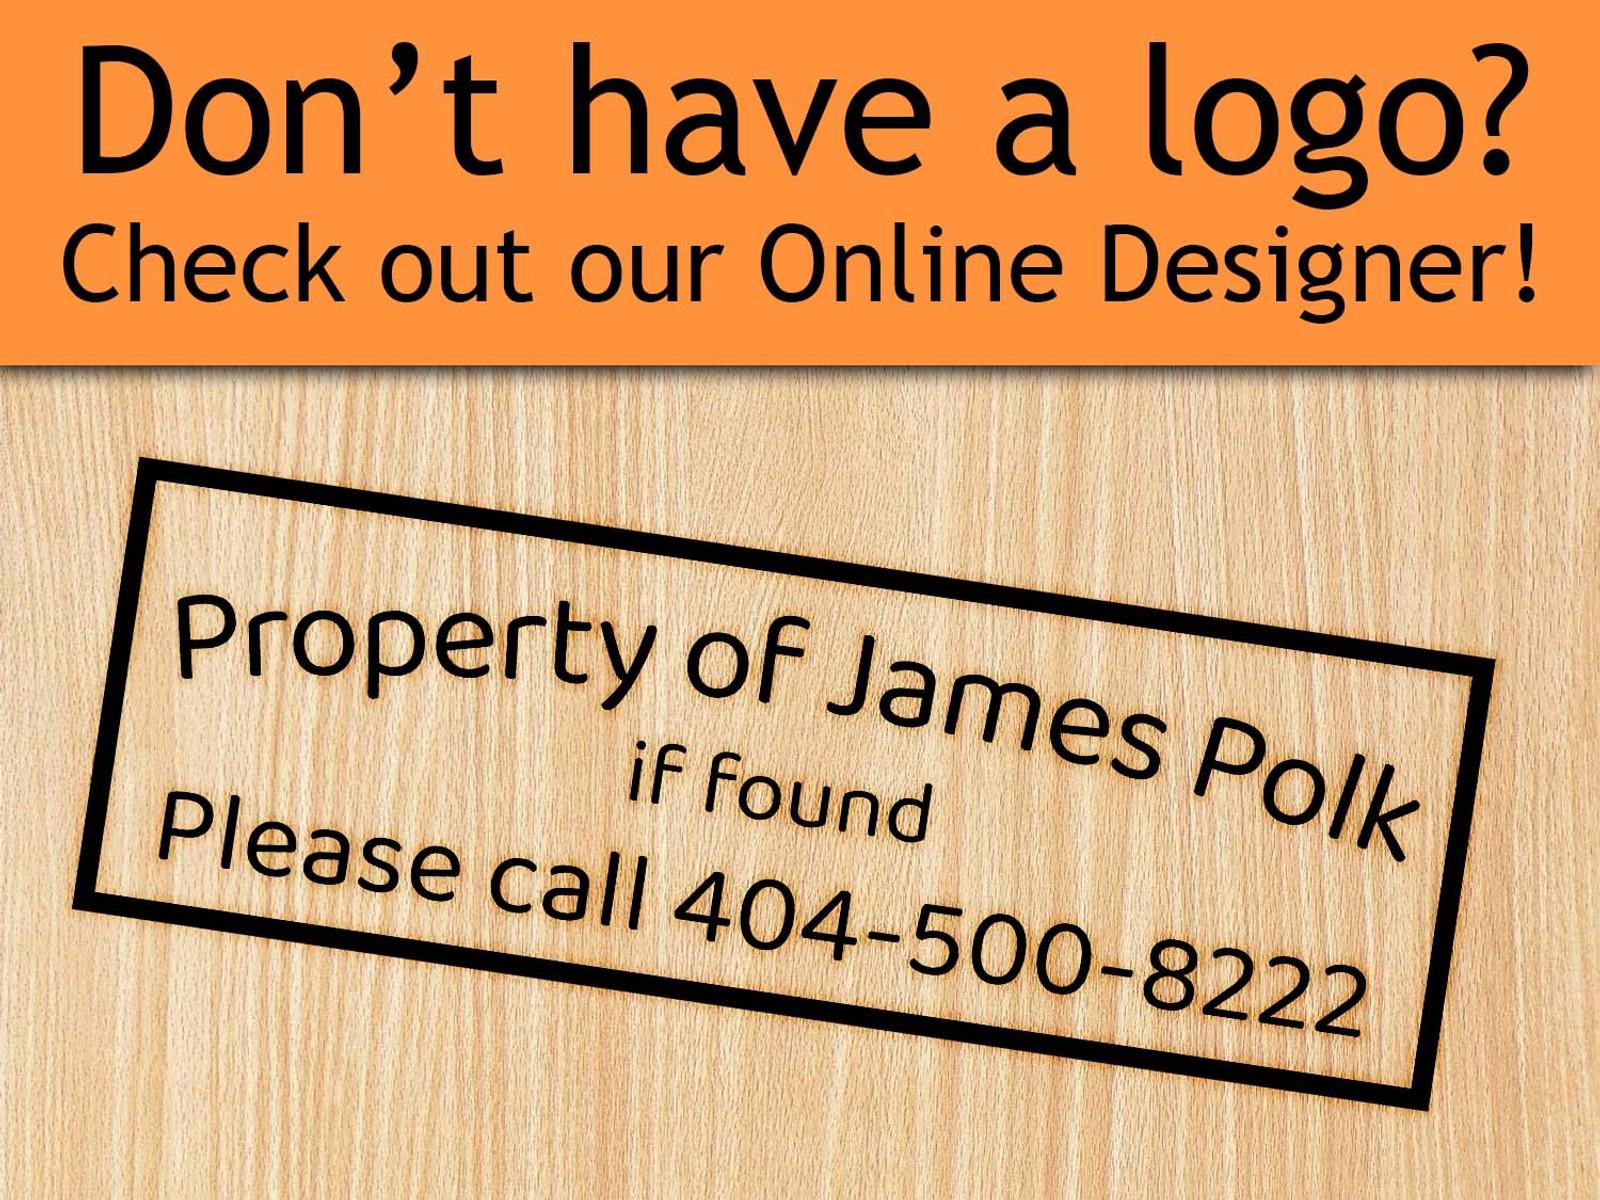 Online Designer - Rectangle Text Only